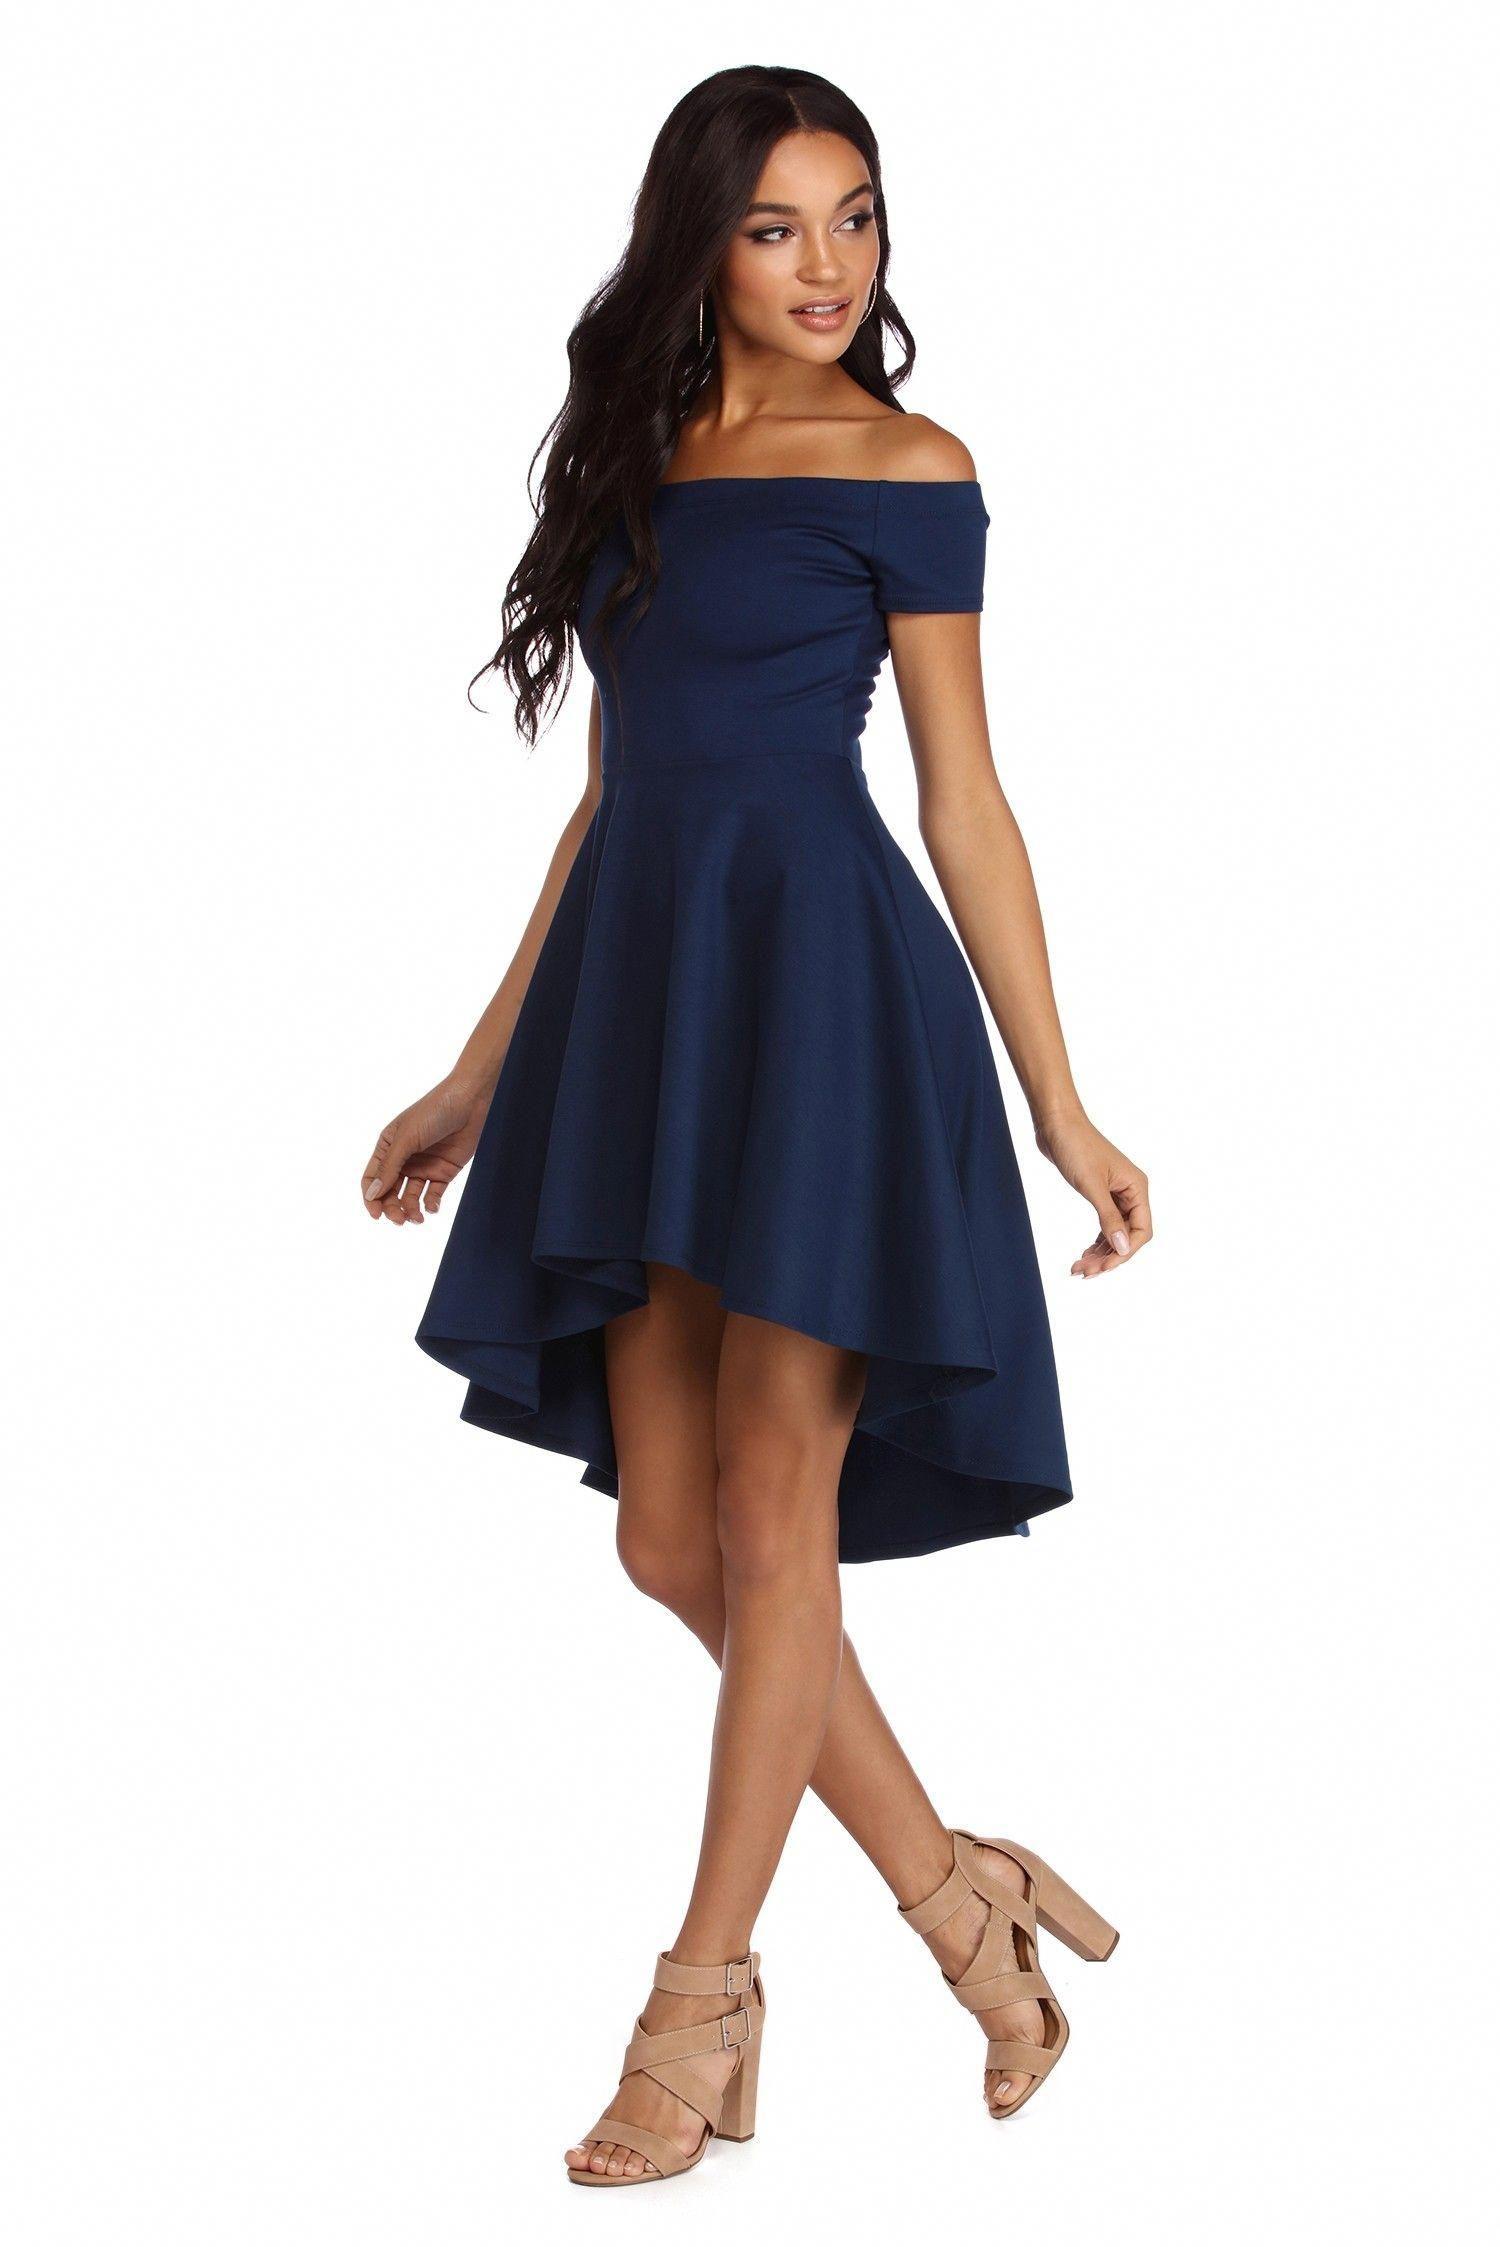 011bed4b657 Dress Fashion Tumblr. Dress Fashion Tumblr Semi Formal ...